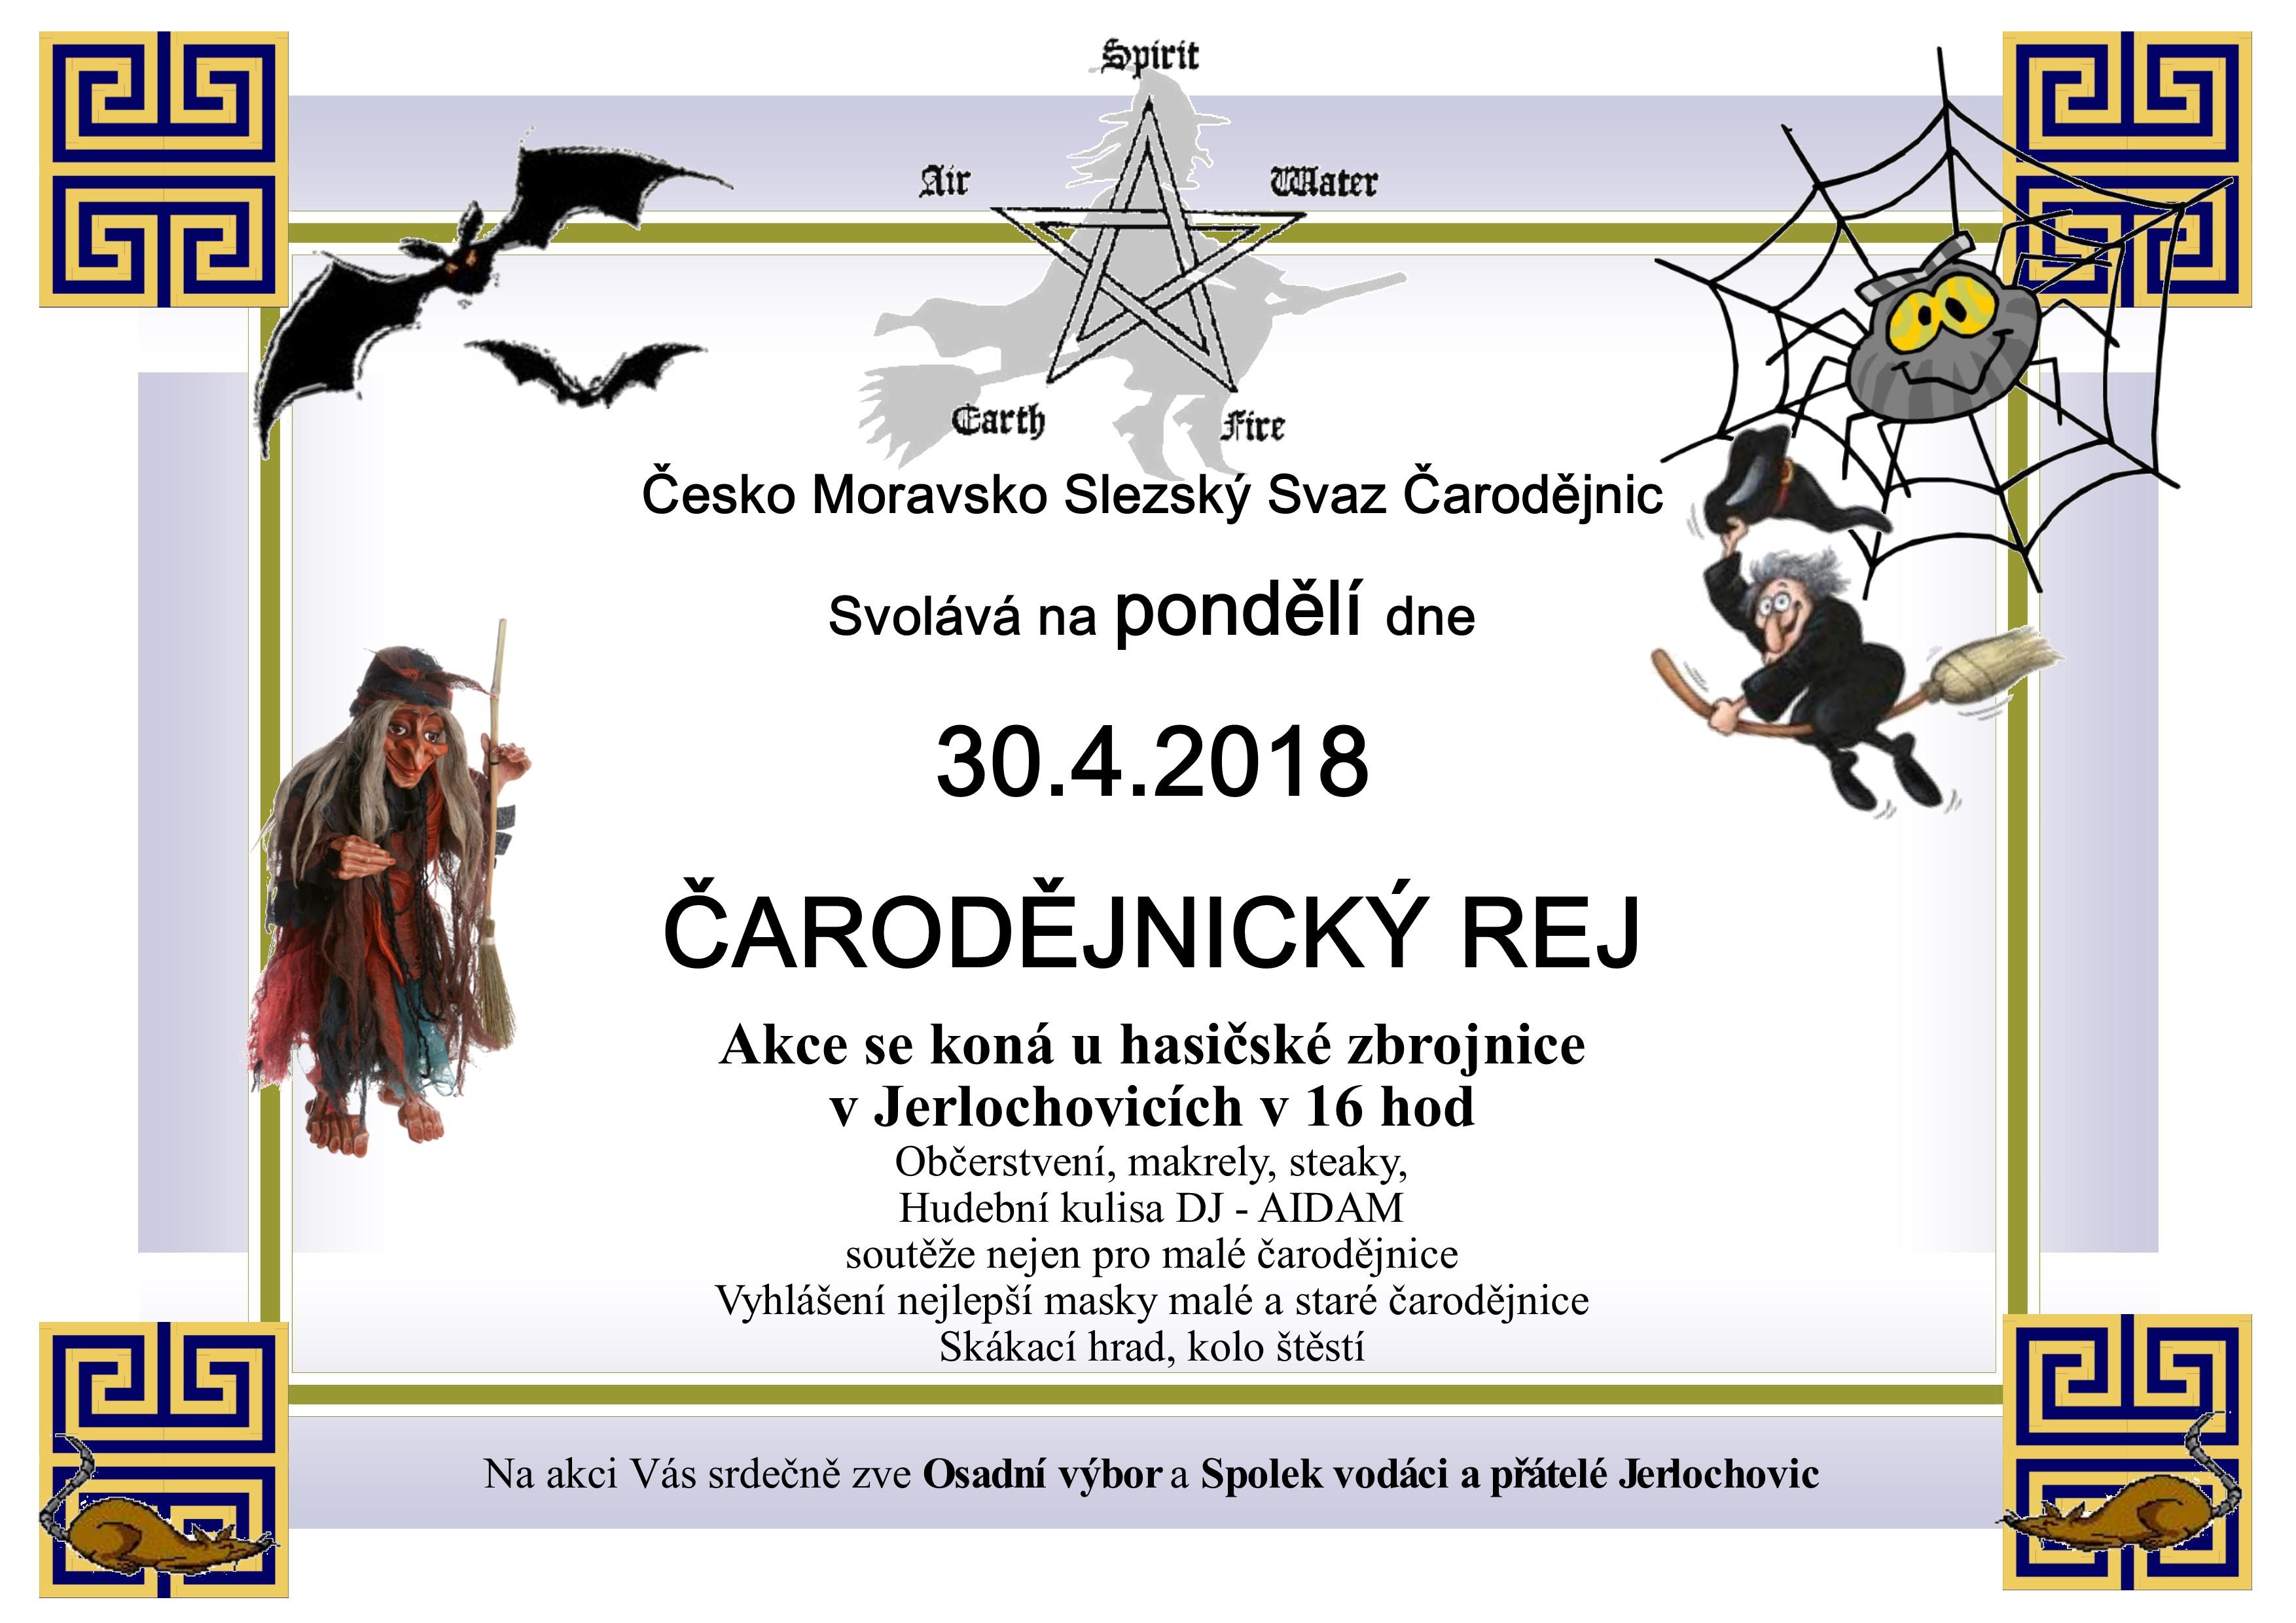 http://www.jerlochovice.cz/file/27/carodejnicky_rej_2018.jpg